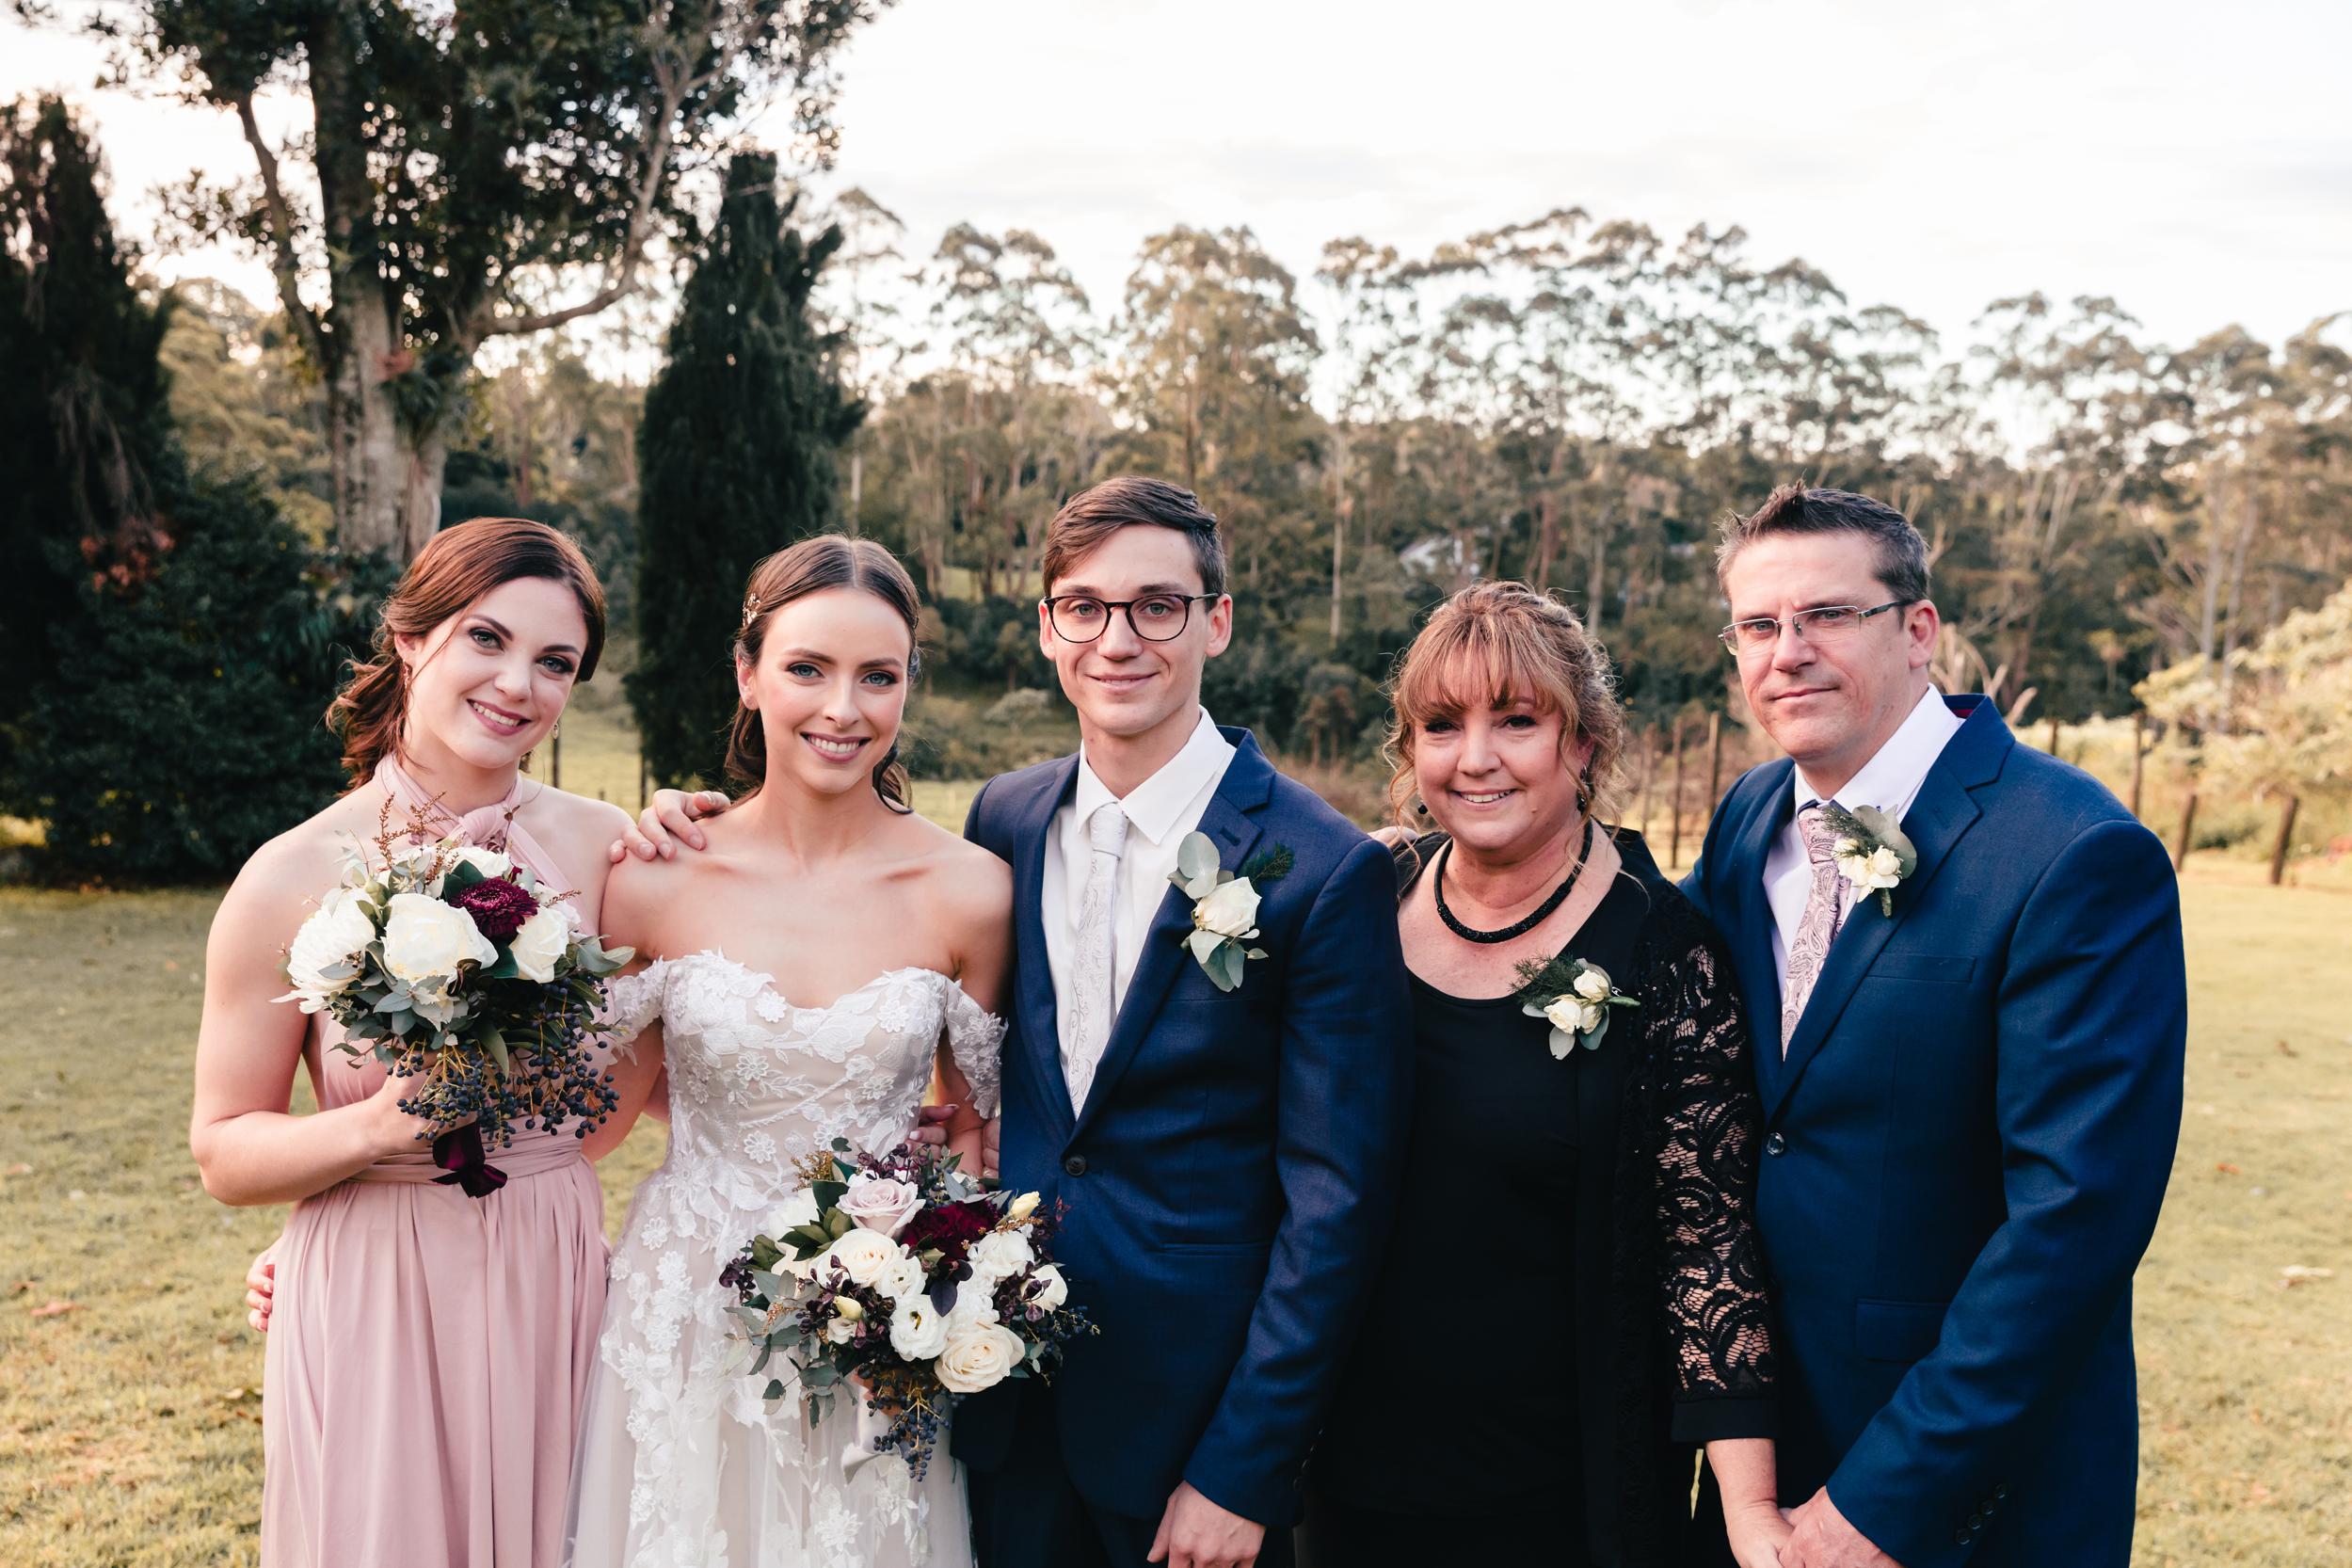 Olivia & Andrew Wedding_Group Photos-7.jpg